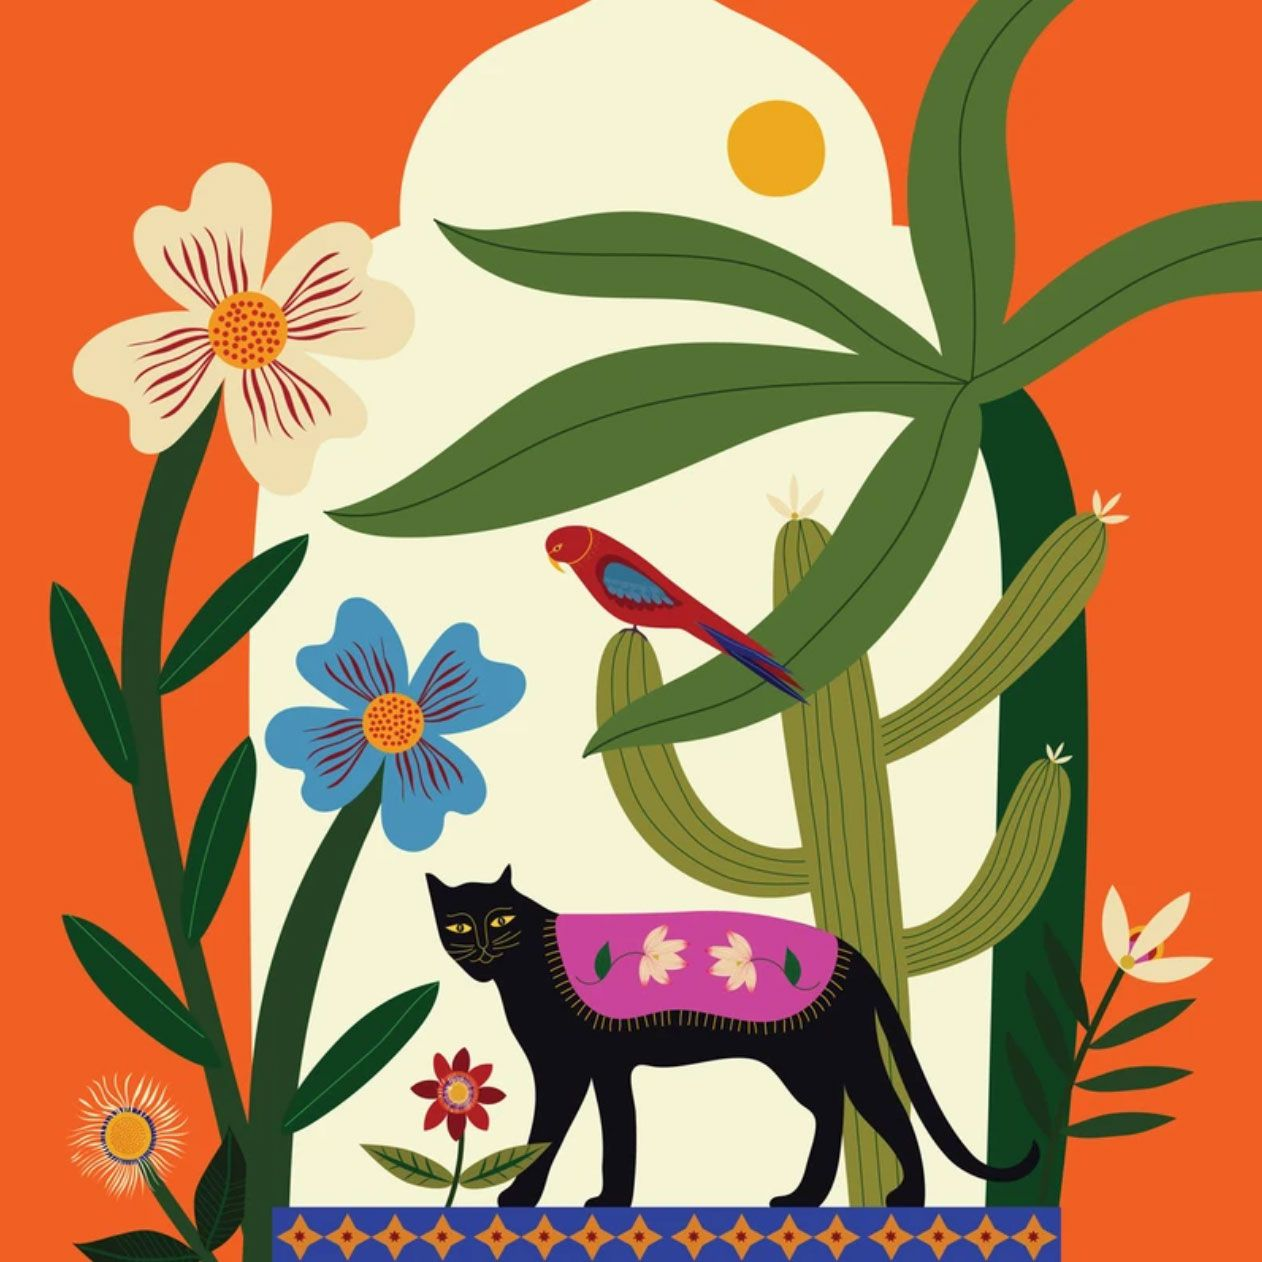 Print by San Diego artist Maheswari Janarthanan